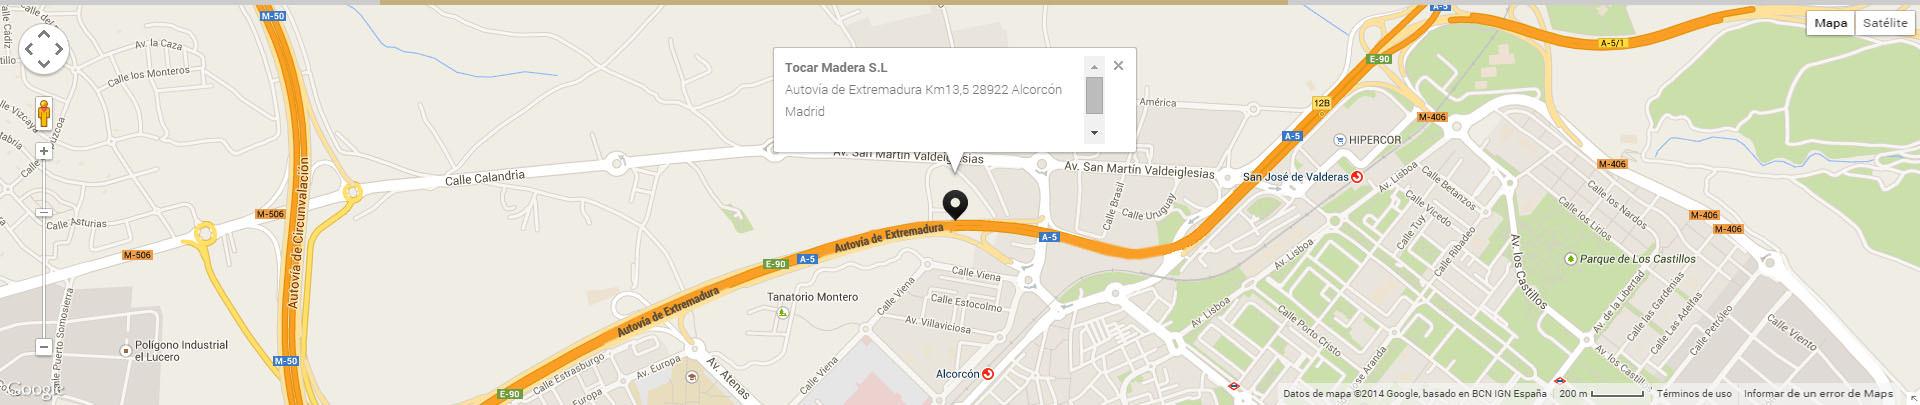 mapa_modificado